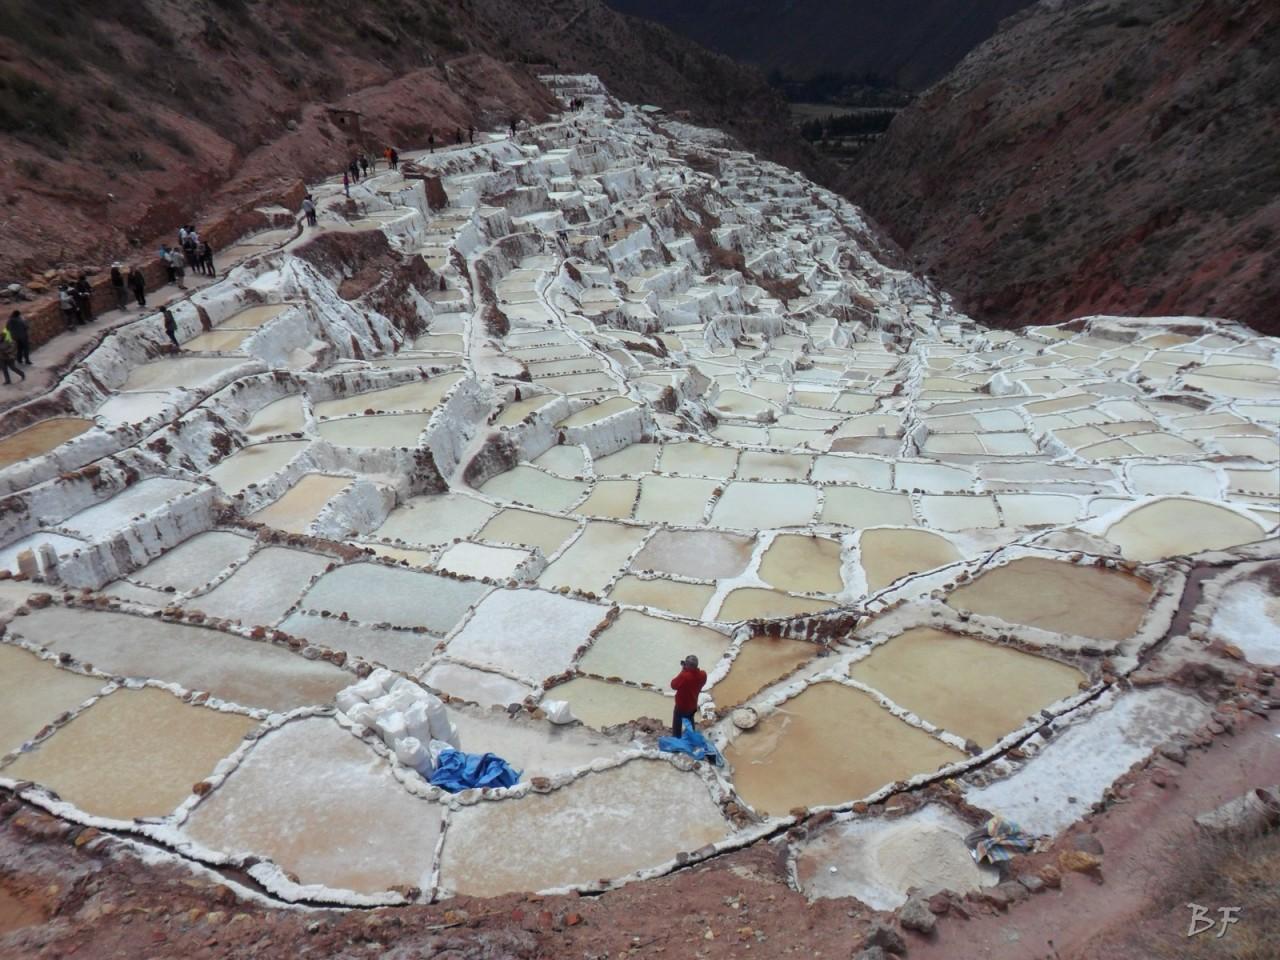 Terrazze-Circolari-Megaliti-Moray-Saline-Maras-Cusco-Perù-13